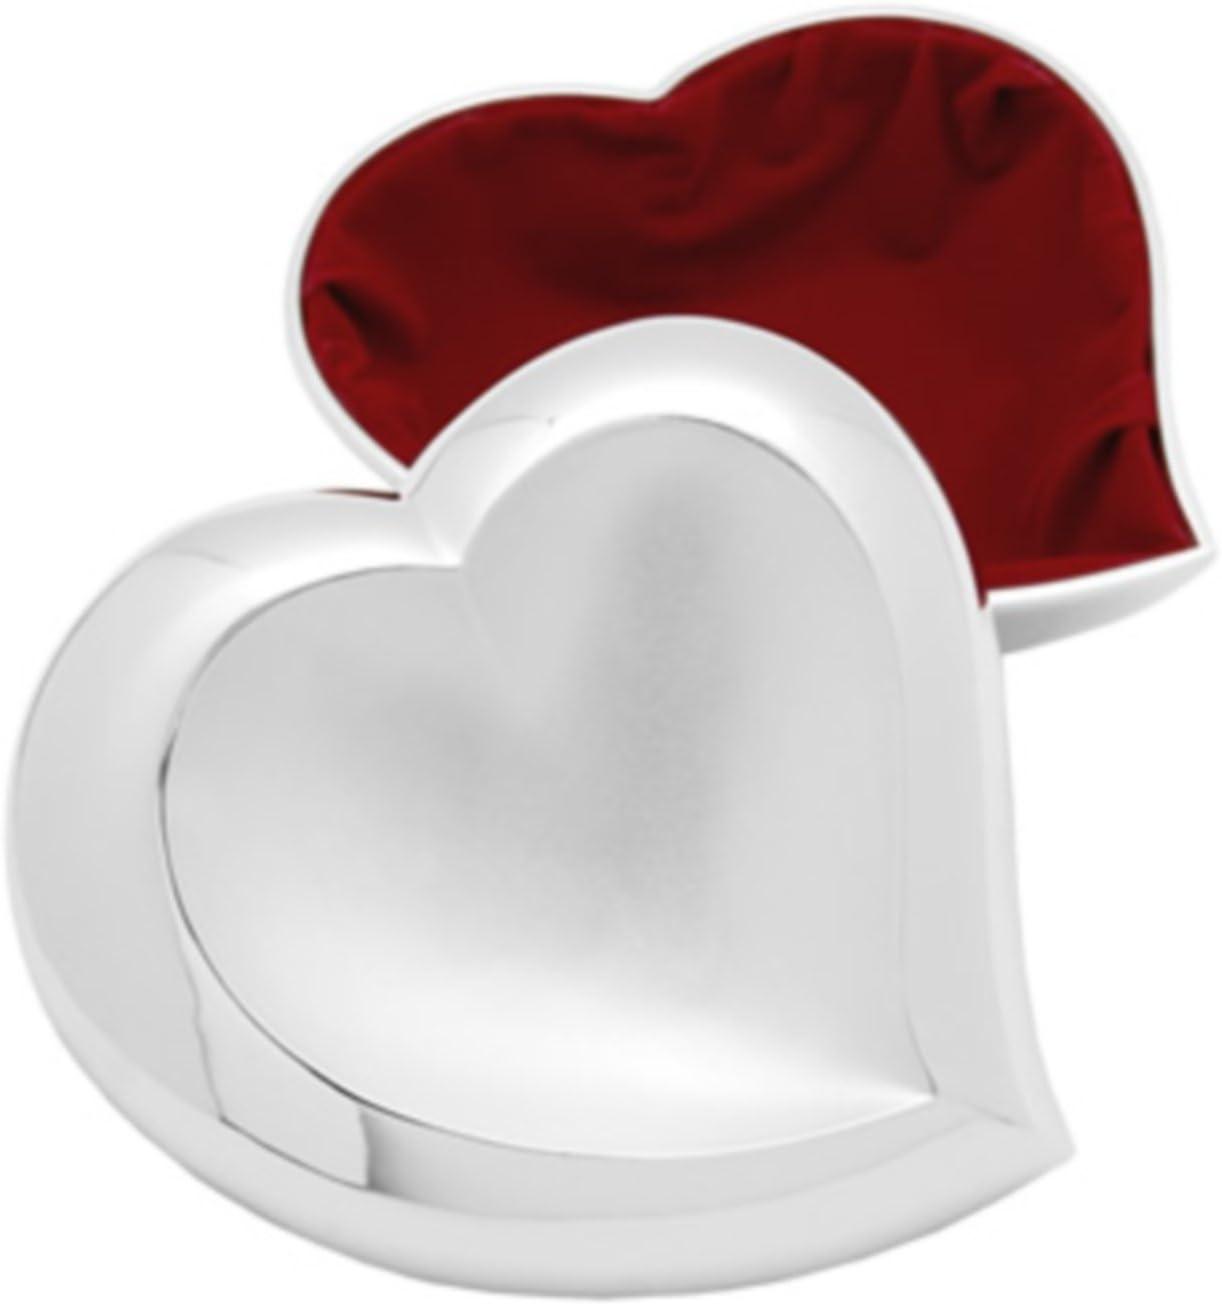 Silver Plated Type Heart Trinket With Red Velvet Inside.